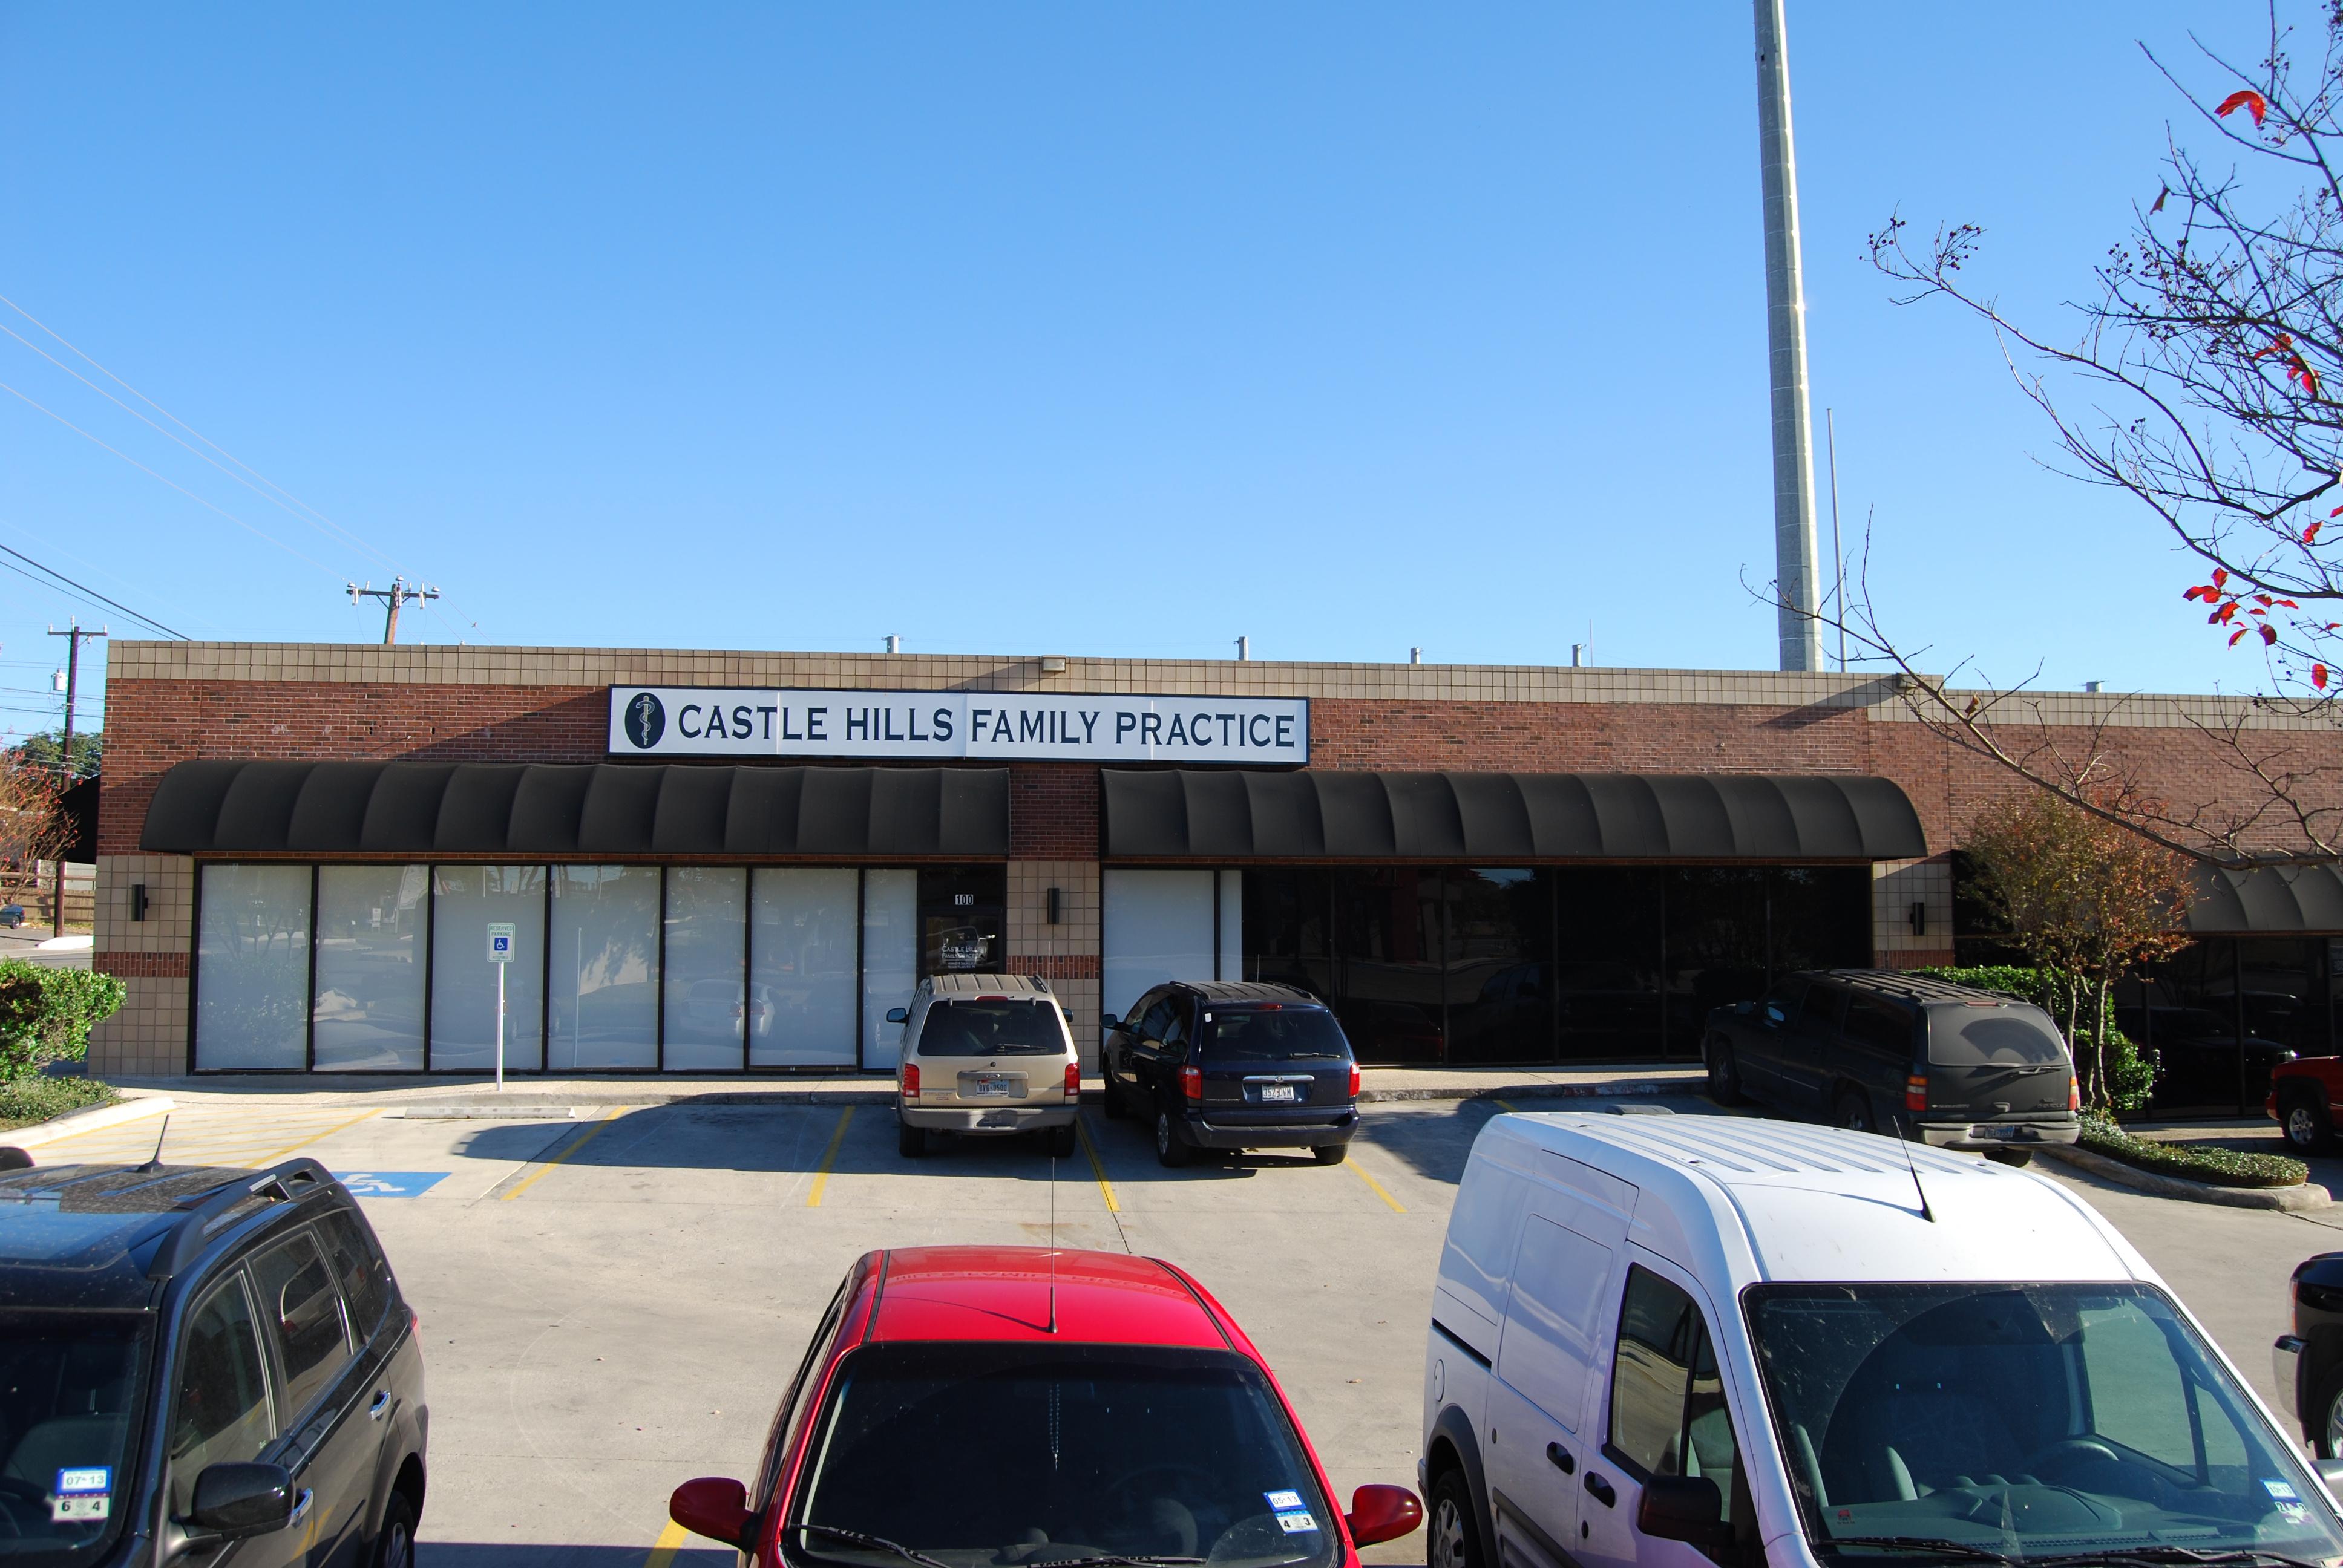 Castle Hills Family Practice